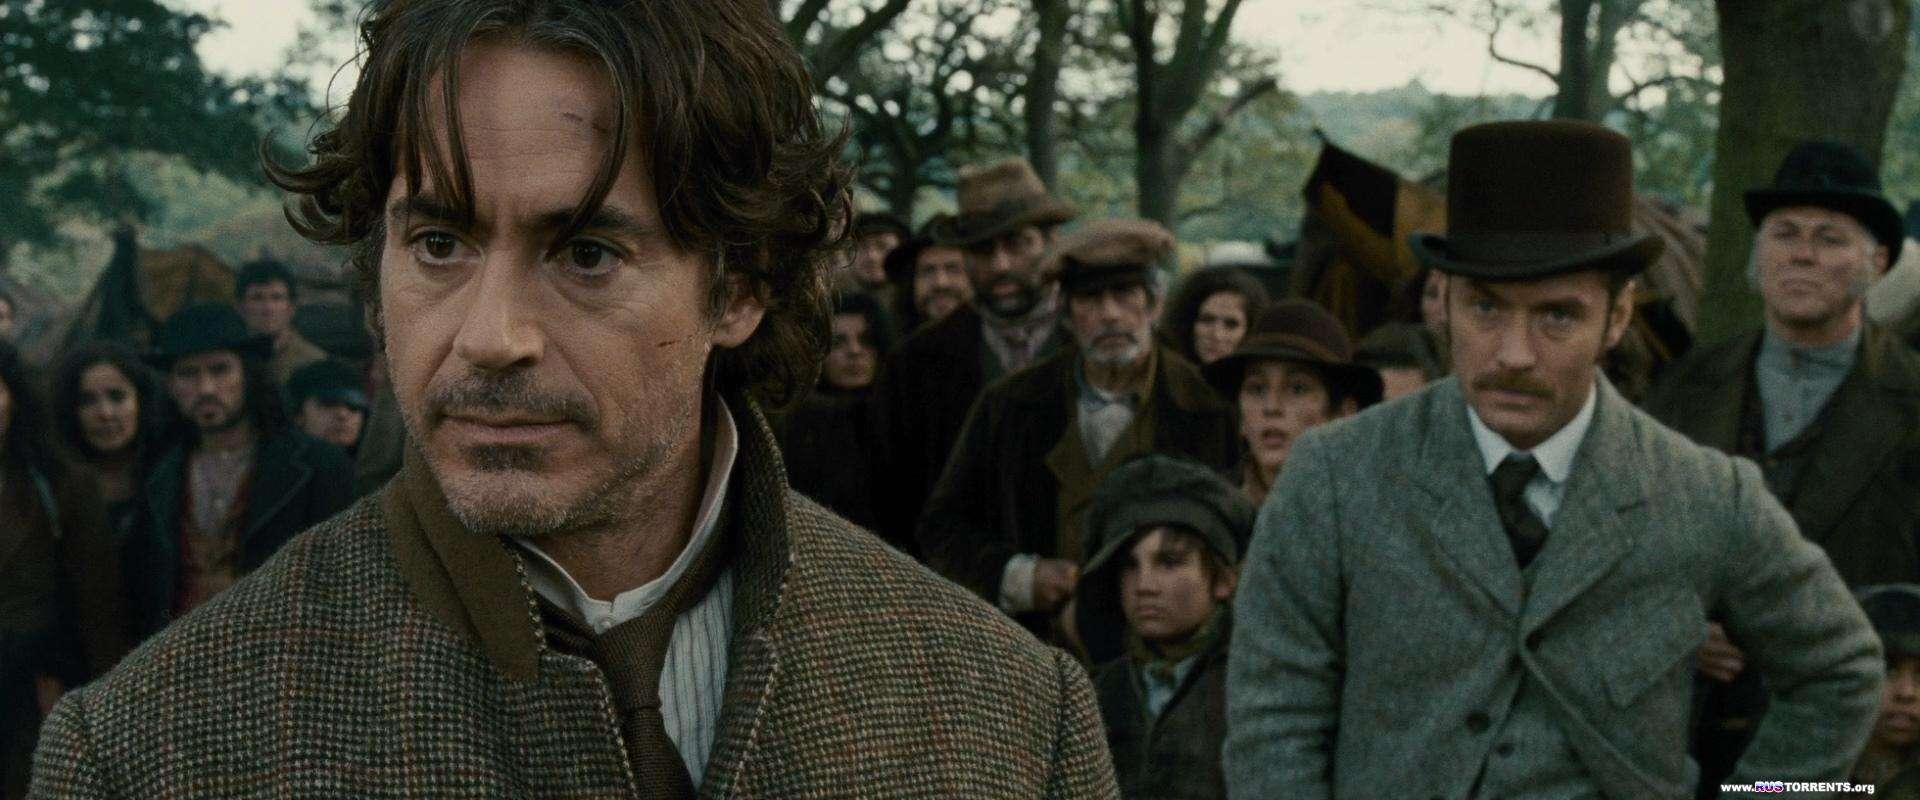 Шерлок Холмс: Игра теней | BDRip 1080p